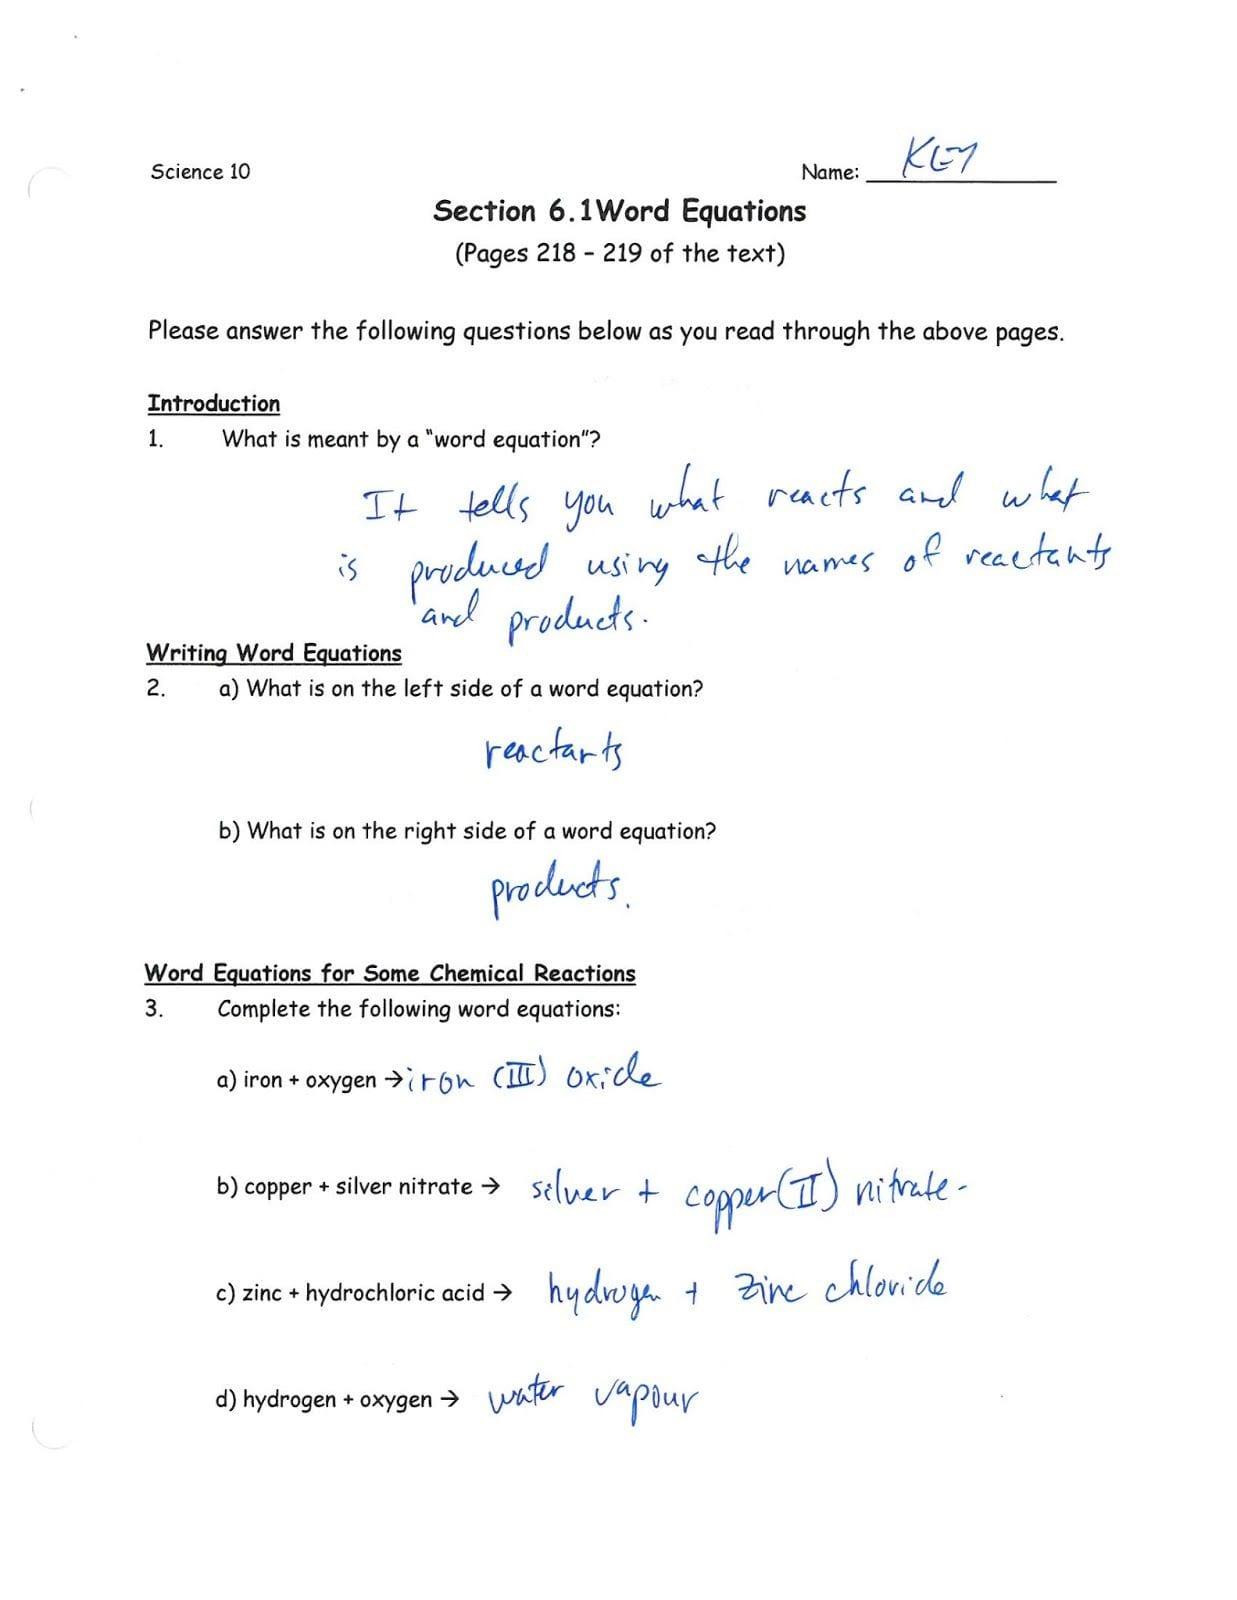 Balancing Nuclear Reactions Worksheet